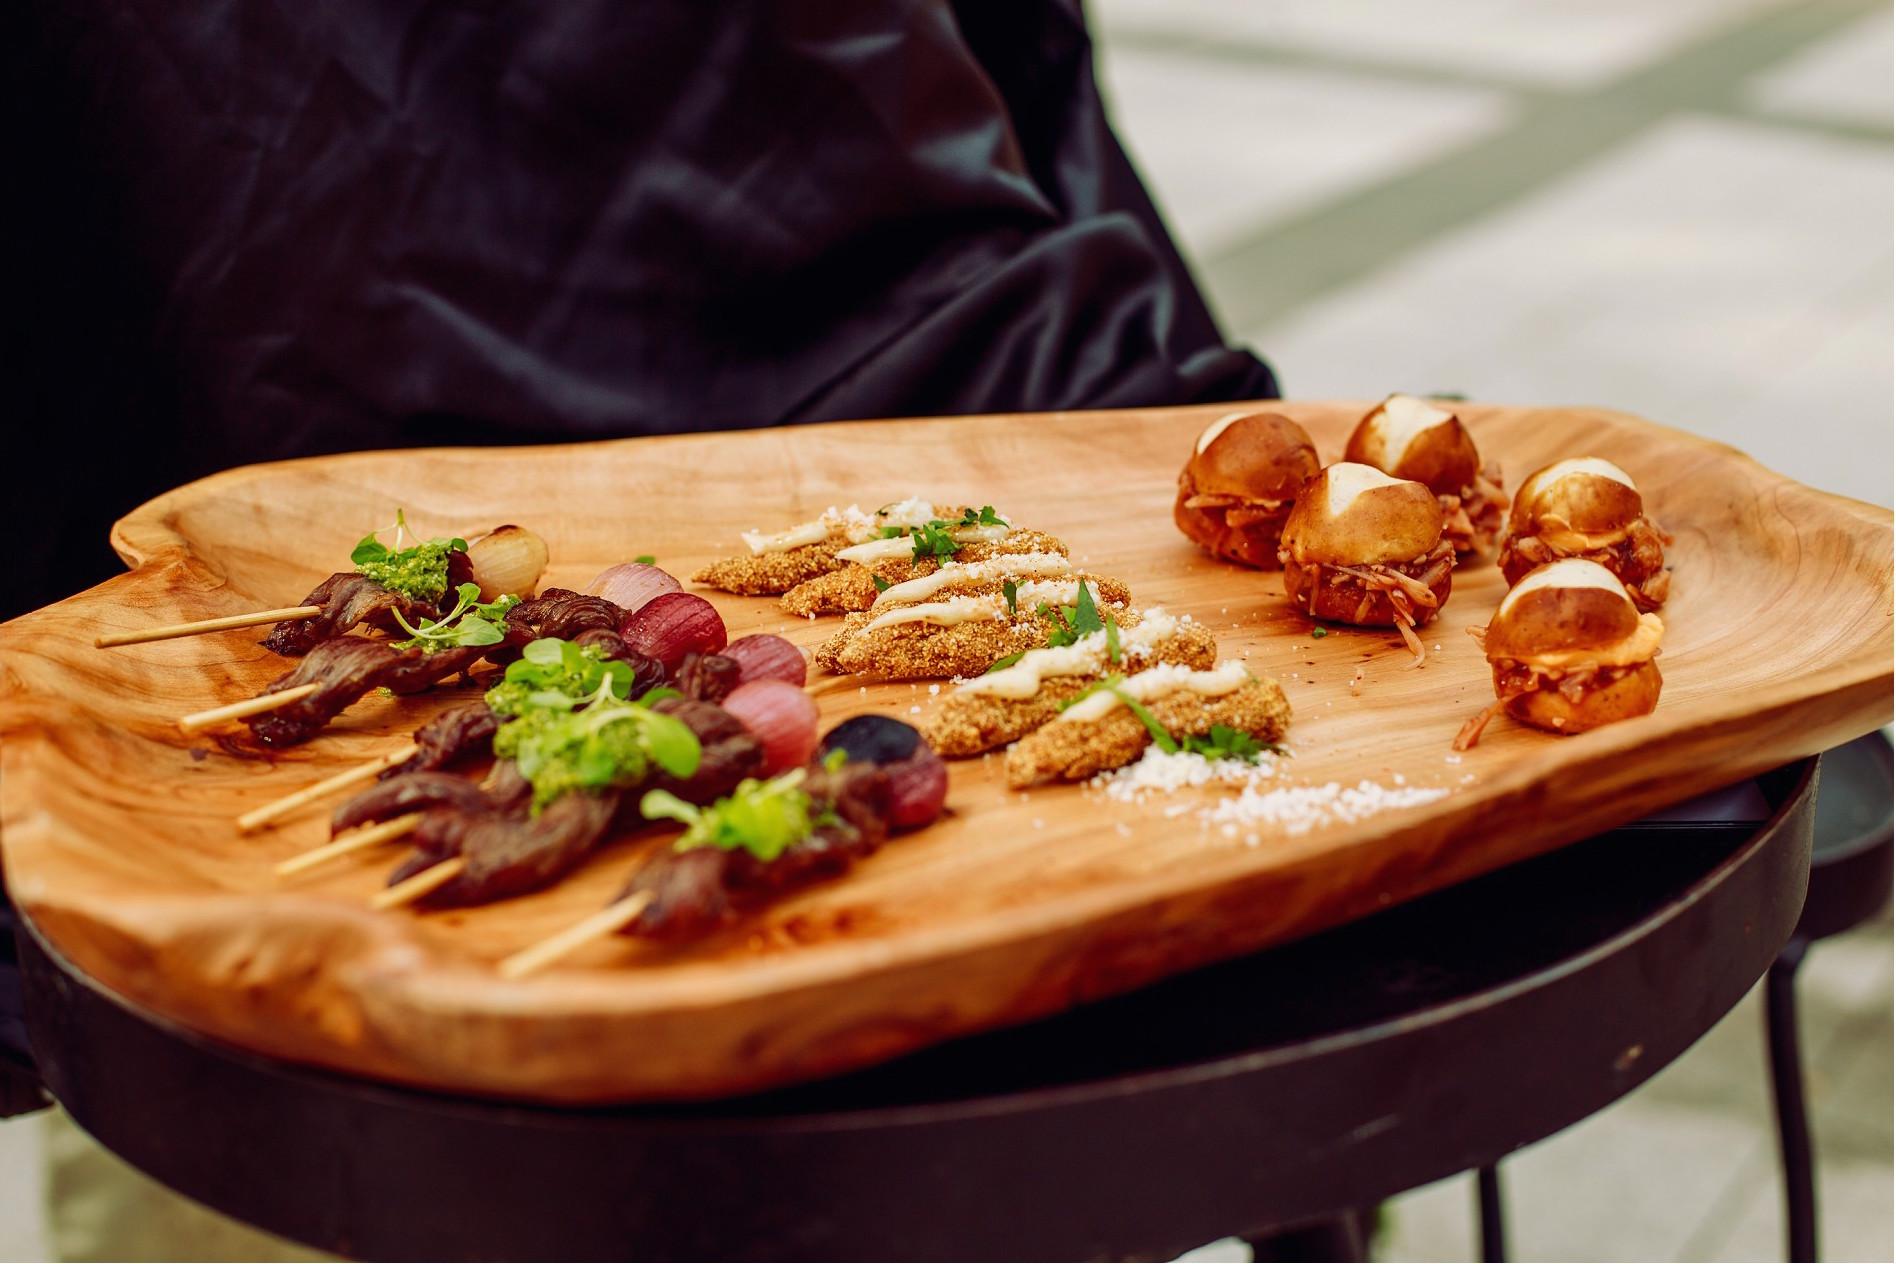 Inspired Catering & Events - Inspired Catering & Events